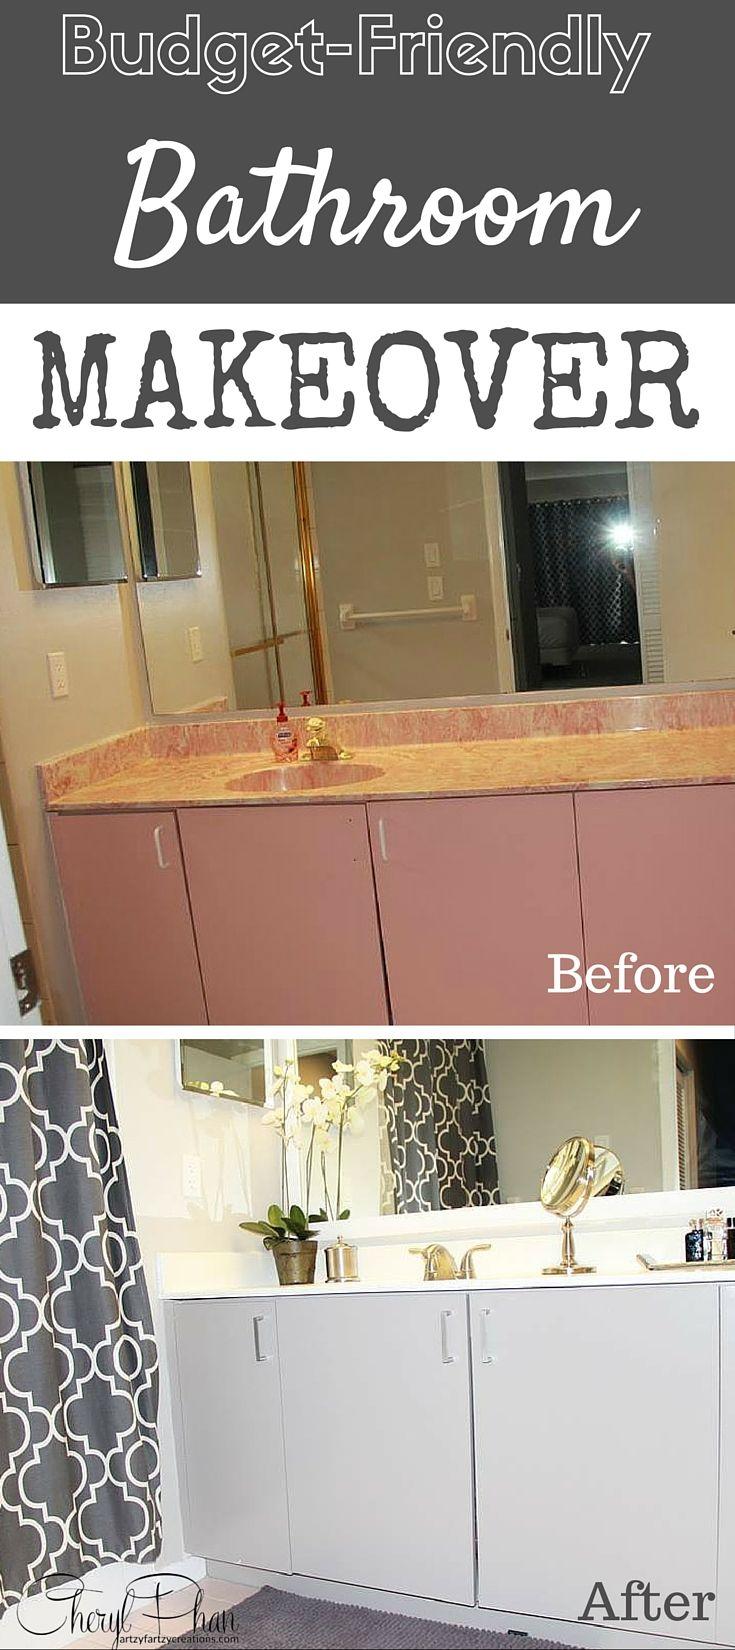 Best 25 budget bathroom ideas on pinterest small - Budget friendly bathroom remodel ...